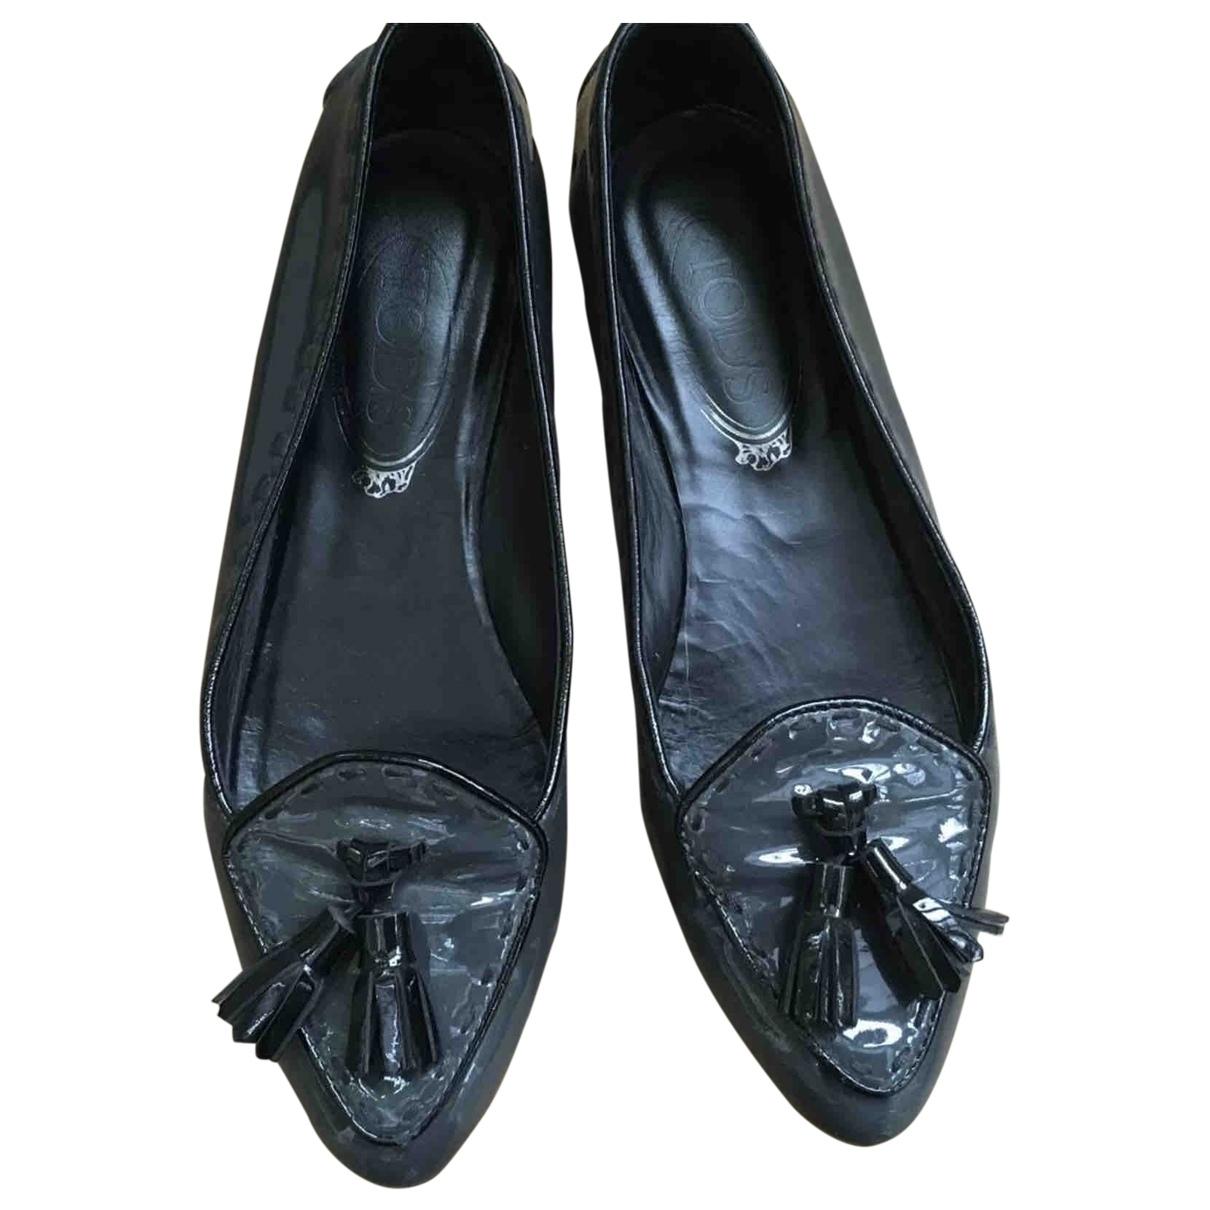 Bailarinas de Charol Tods